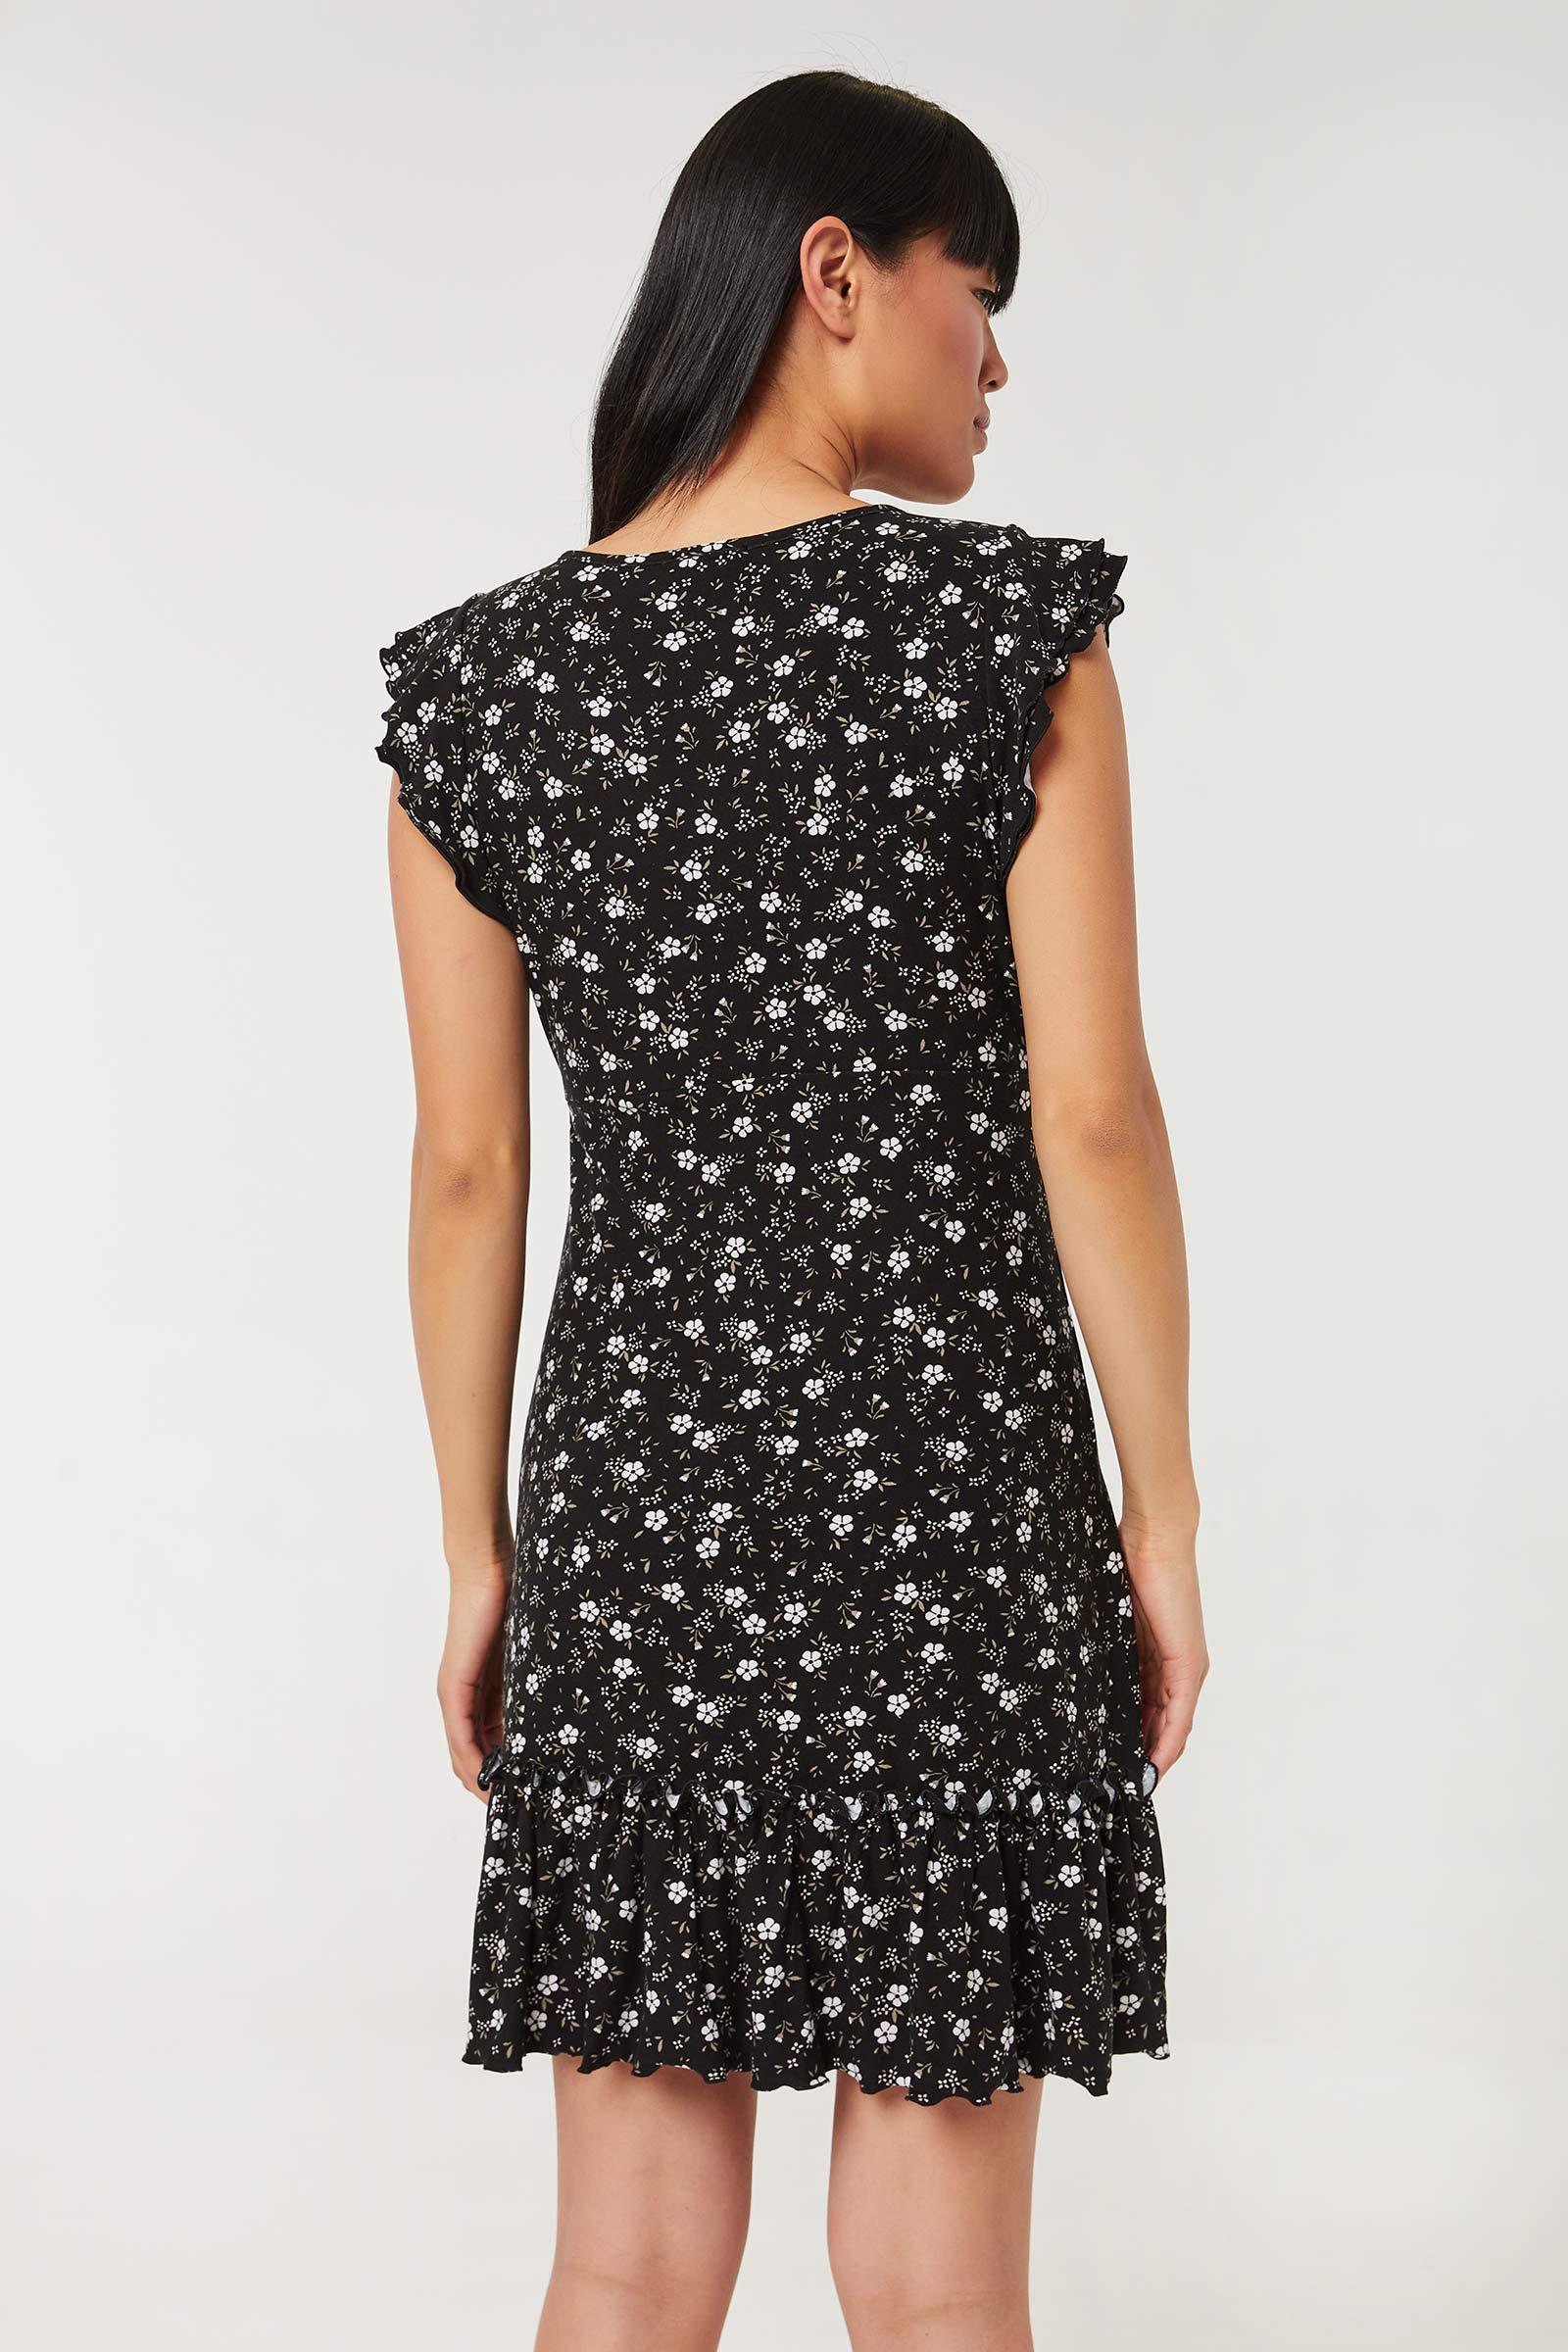 Ditsy Floral Mini Dress with Flounces